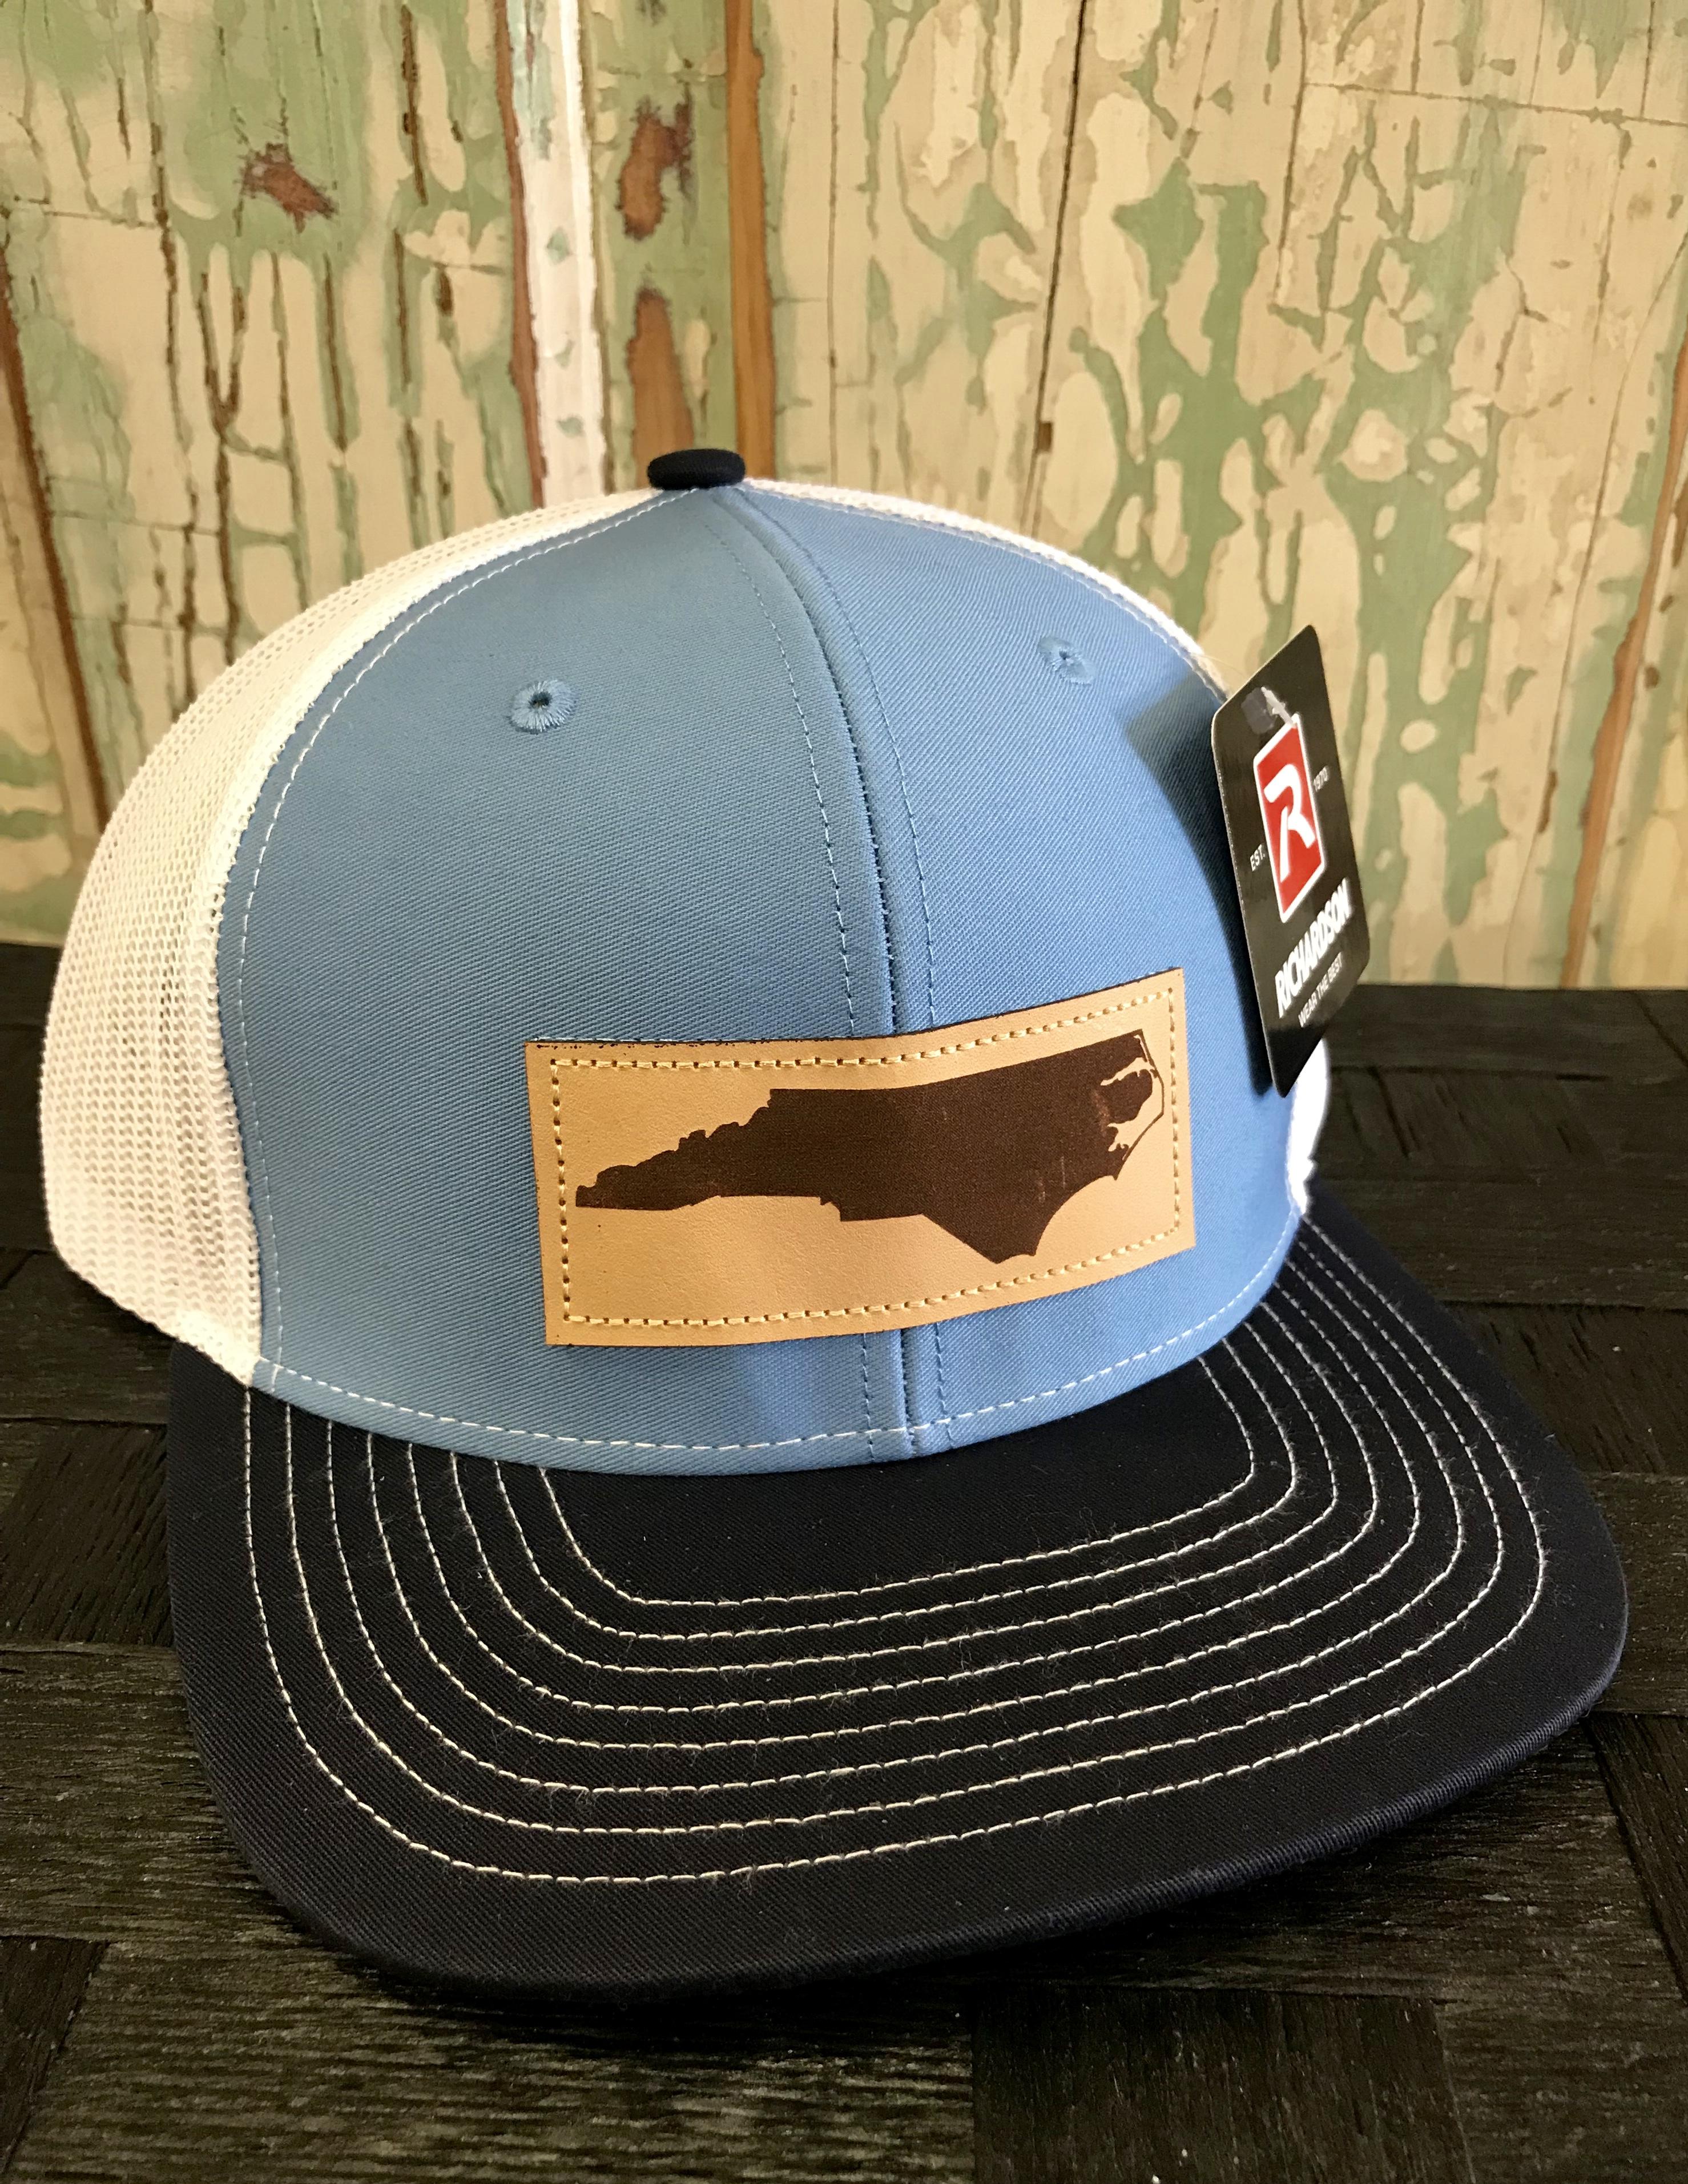 5b542251fc249 Richardson Mesh Back North Carolina Leather Patch Trucker Hat Columbia Blue  White Navy Accessories